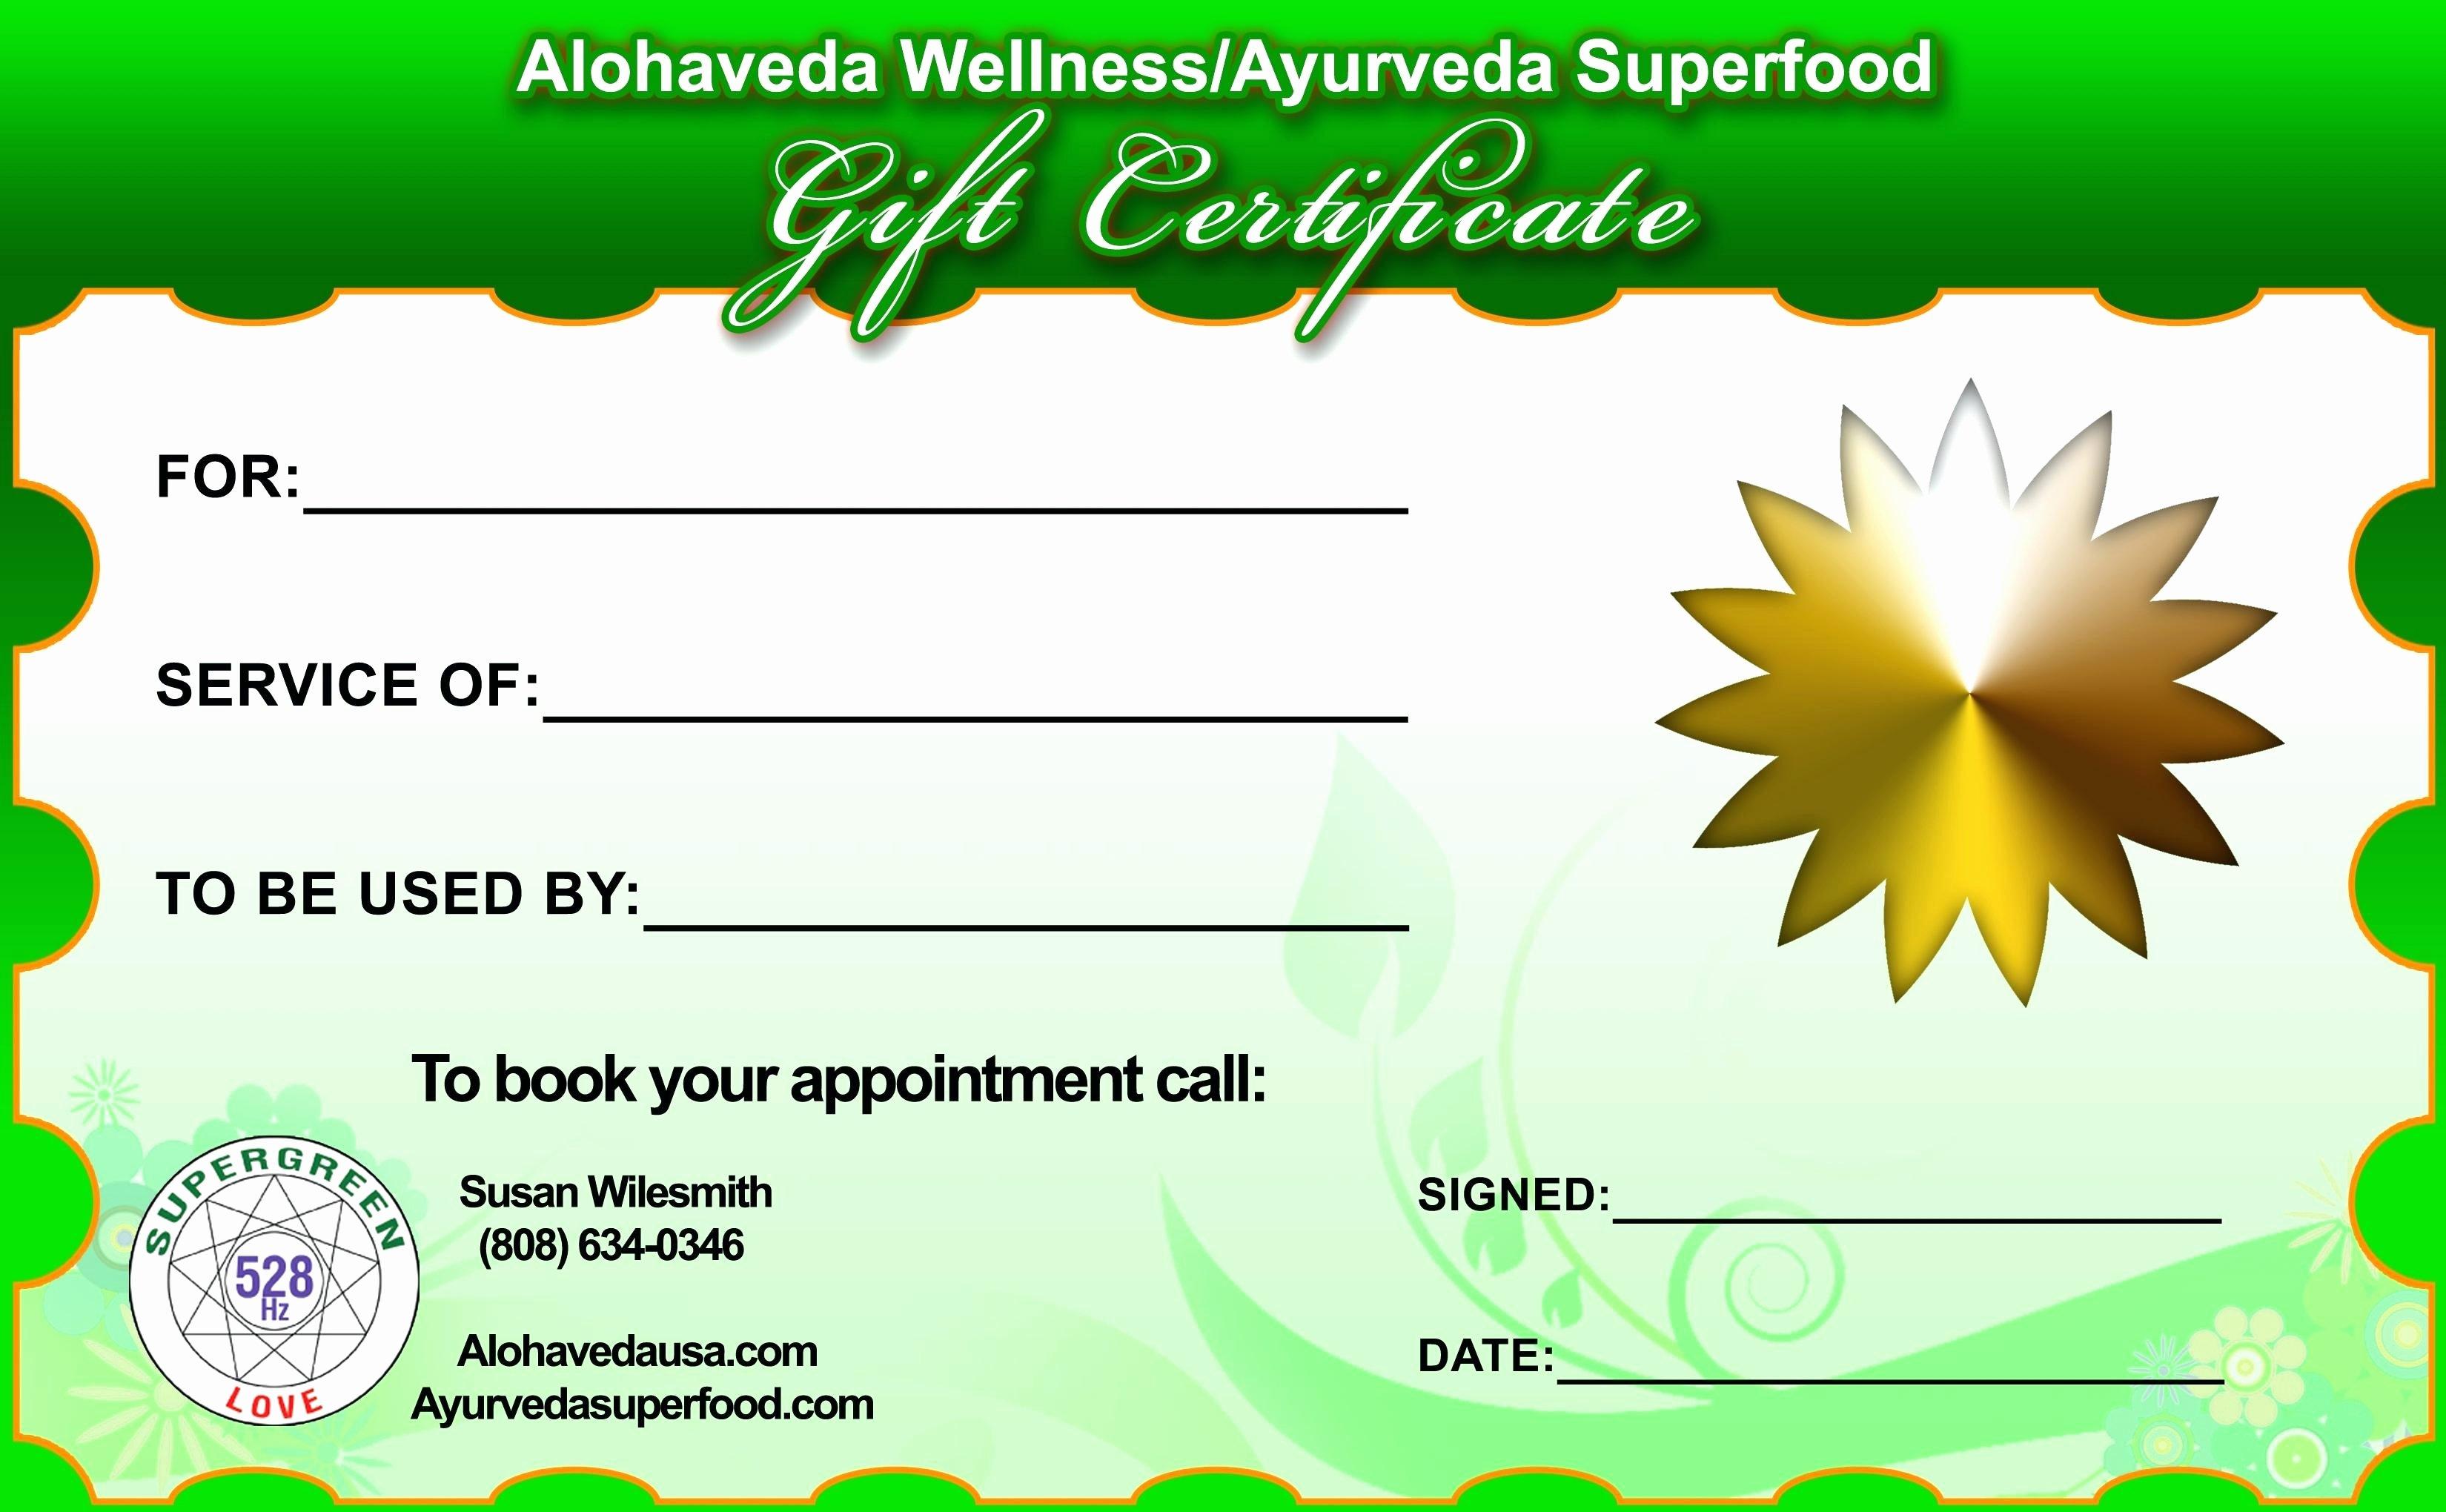 Hotel Gift Certificate Template Fresh Template Hotel Gift Certificate Template Printable